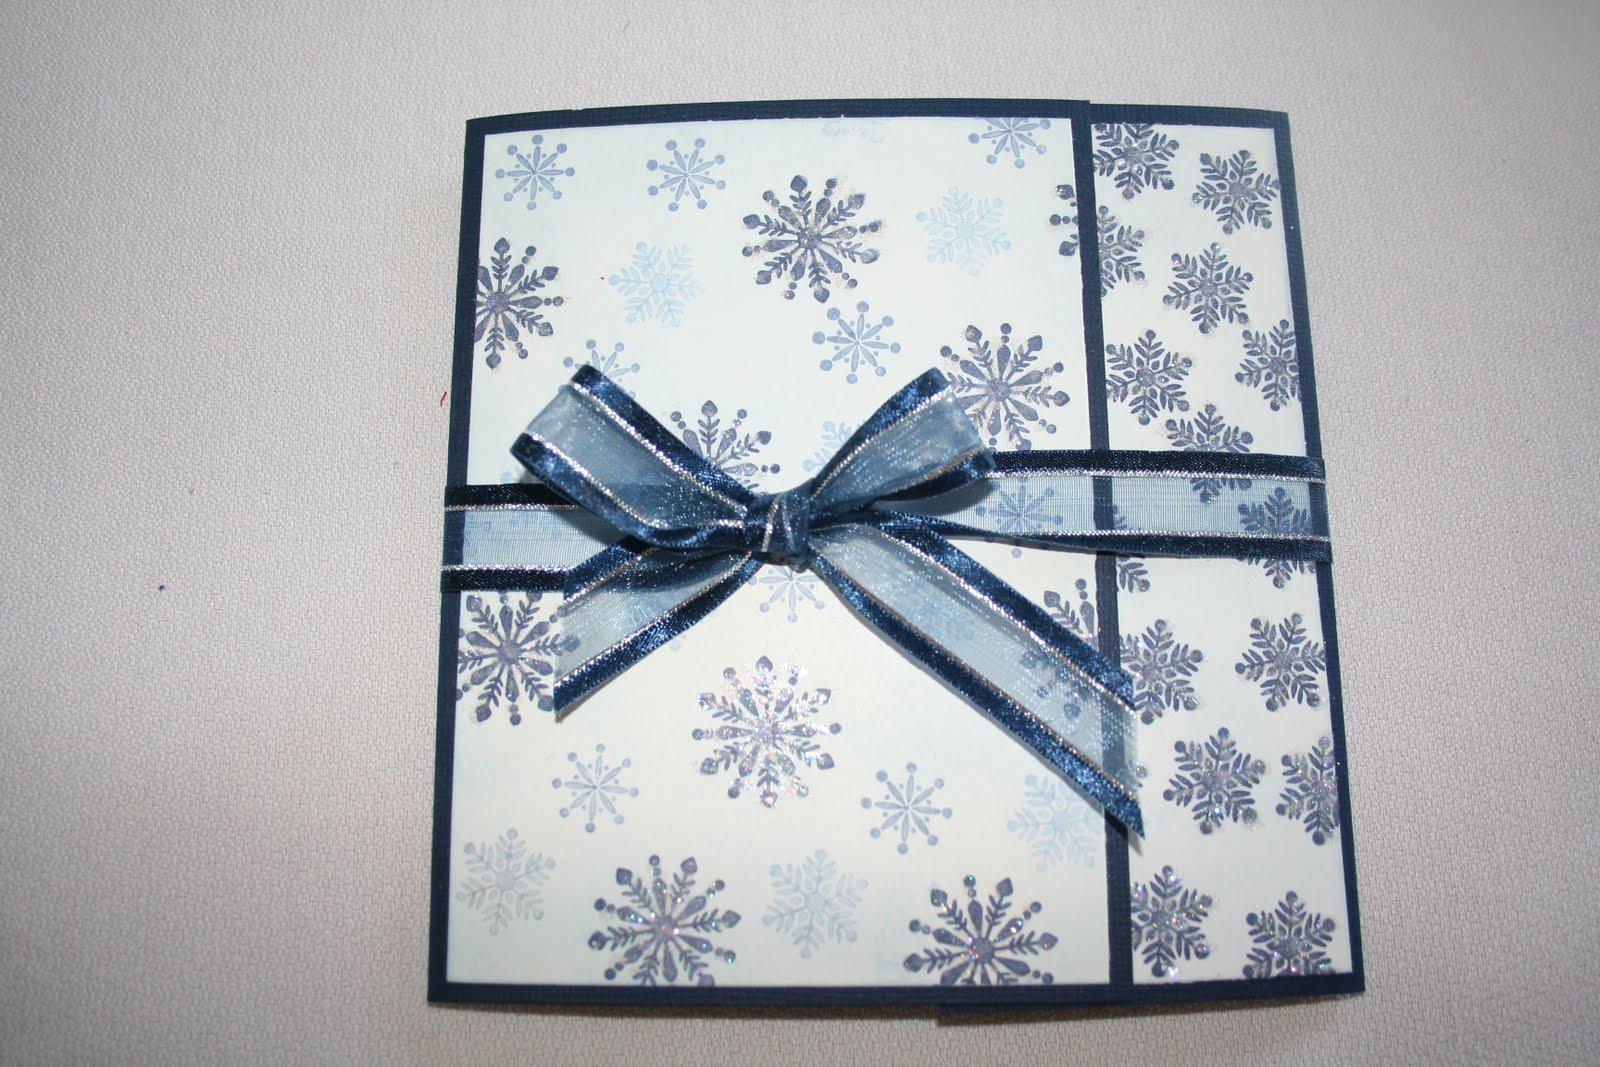 la magie de miss jenny enveloppe cadeau de no l. Black Bedroom Furniture Sets. Home Design Ideas